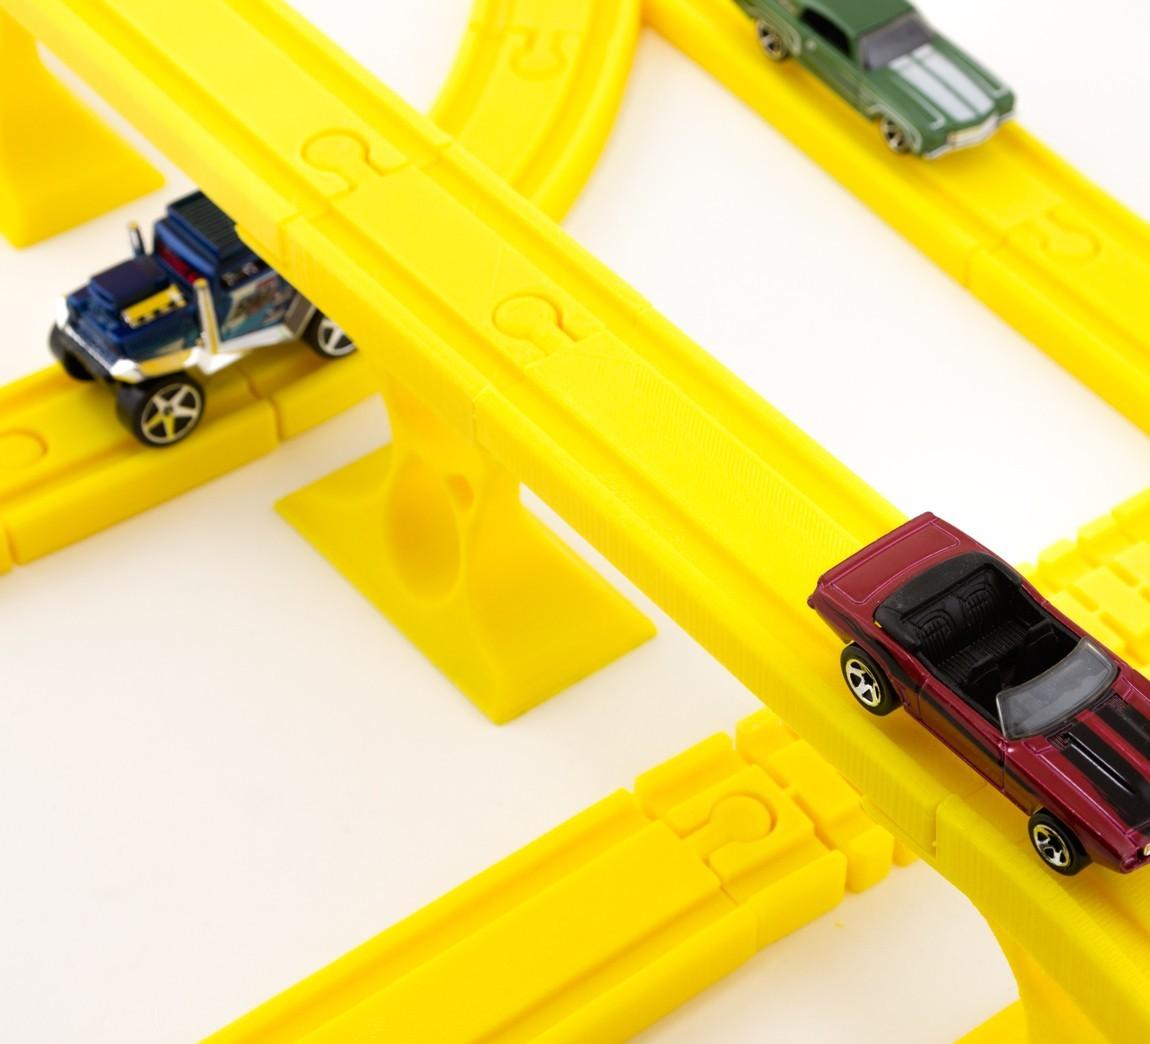 91cb4f62ceb4627f4039d91b0e40adb8_1449686544596_12.2.15-product-shoot-023.jpg Download free STL file Toy Train Tracks • 3D printer design, FerryTeacher